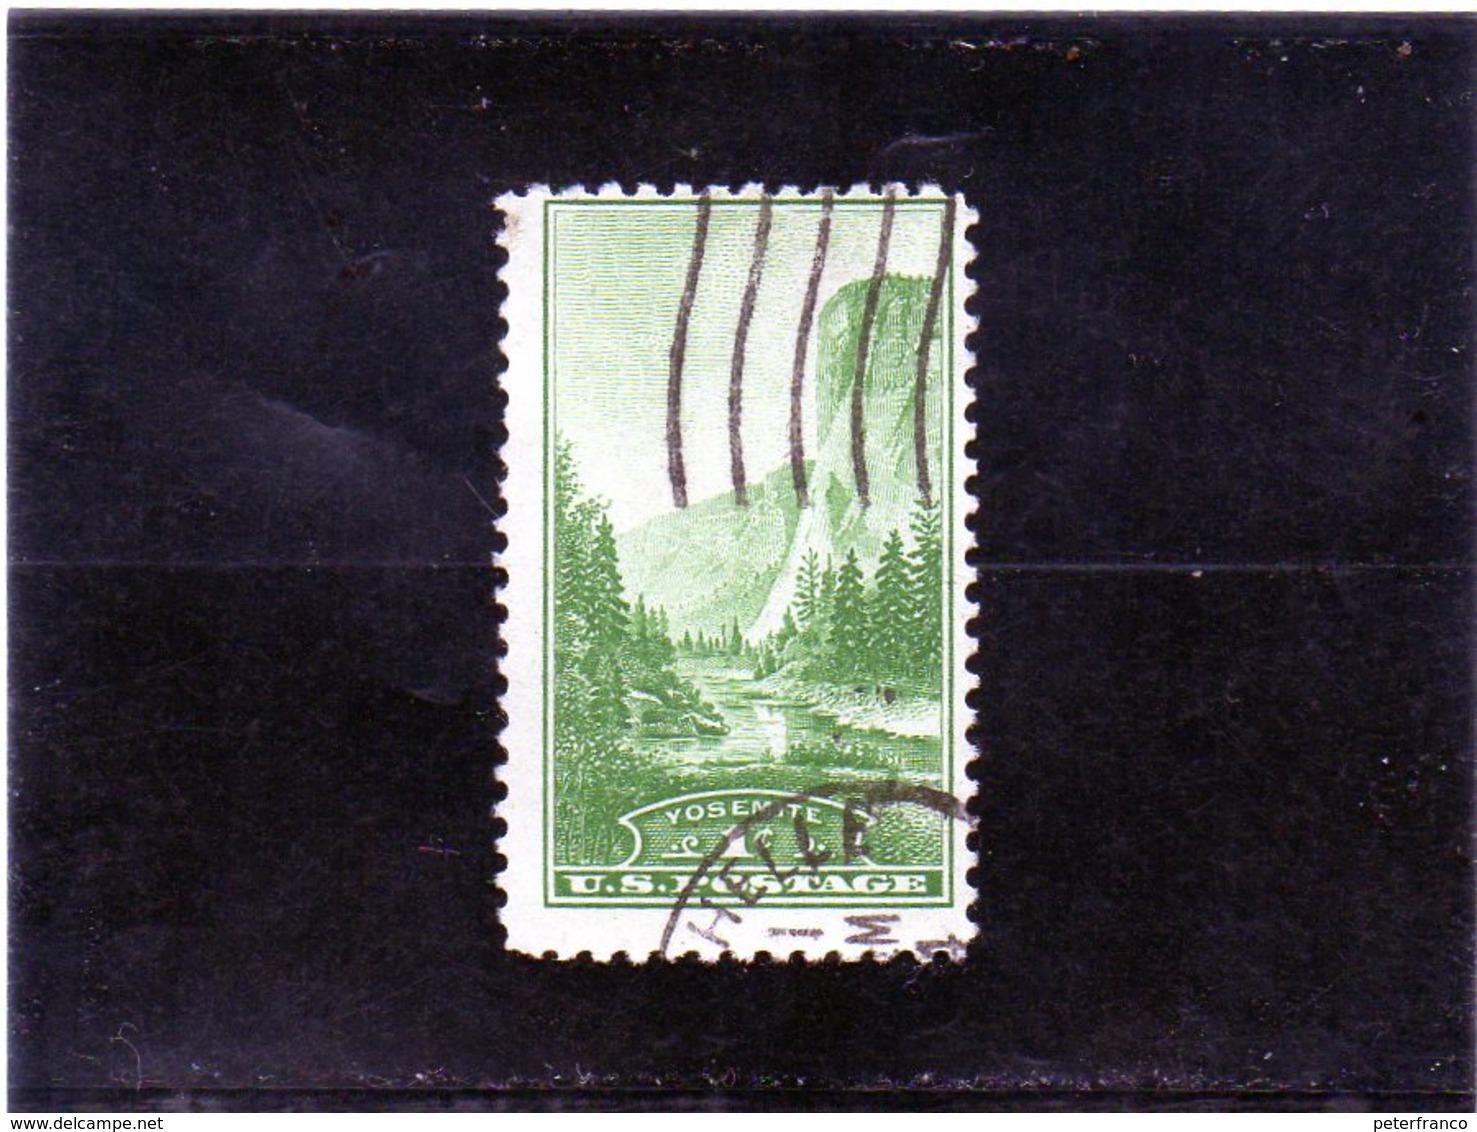 B - 1934 Stati Uniti - El Capitan Summit - Yosemite Park - Vereinigte Staaten